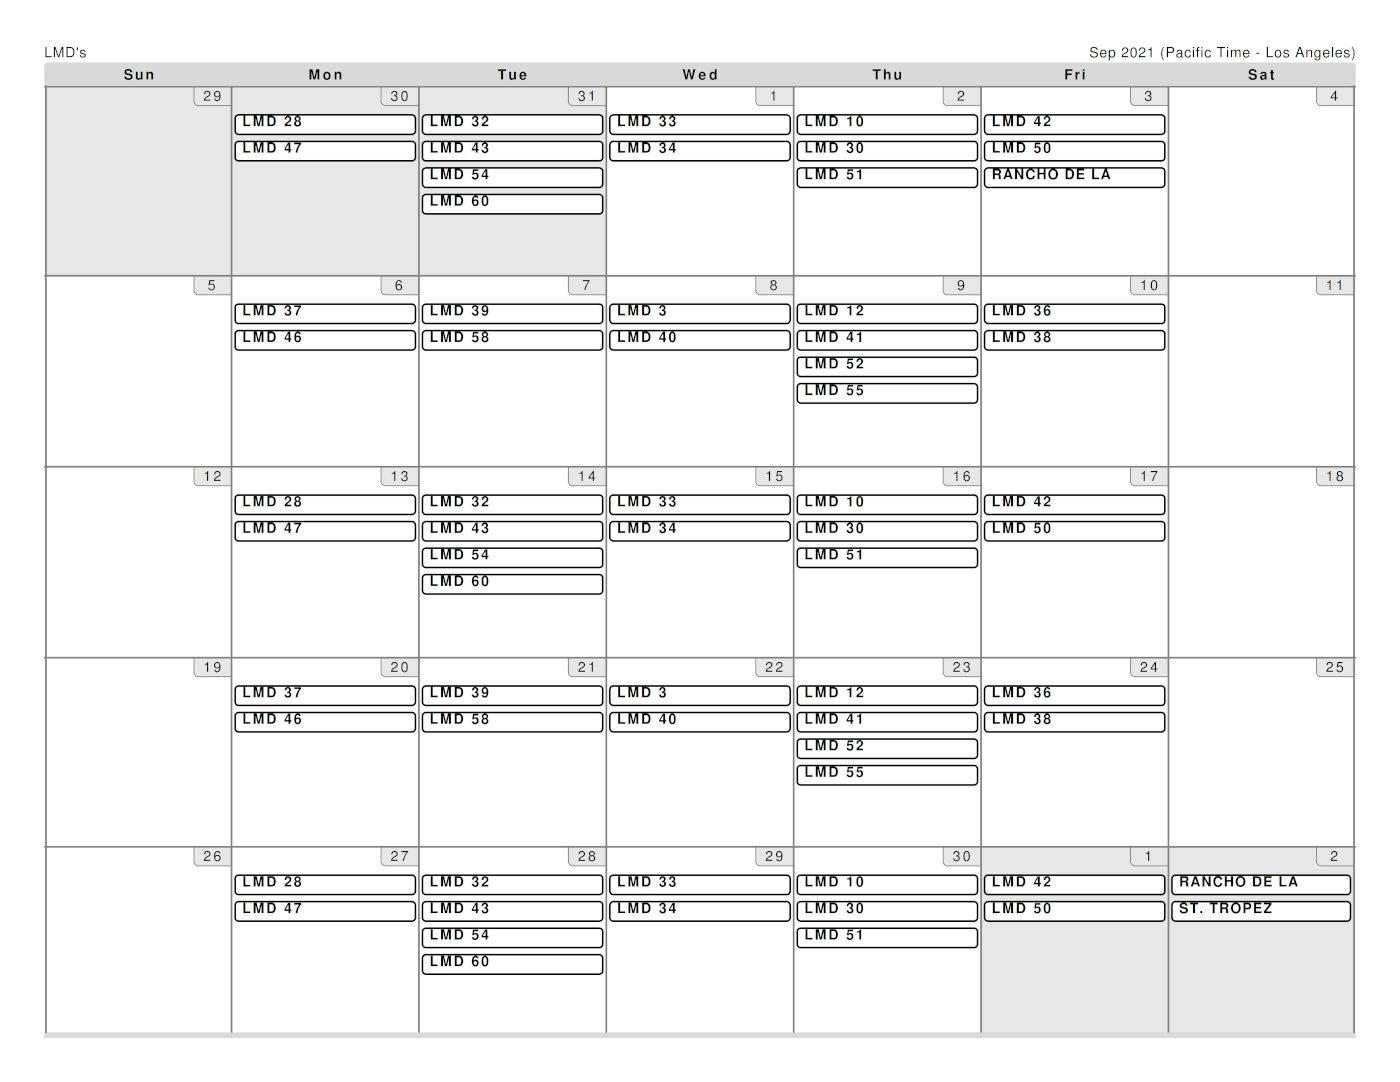 Garcia Schedule for September 2021